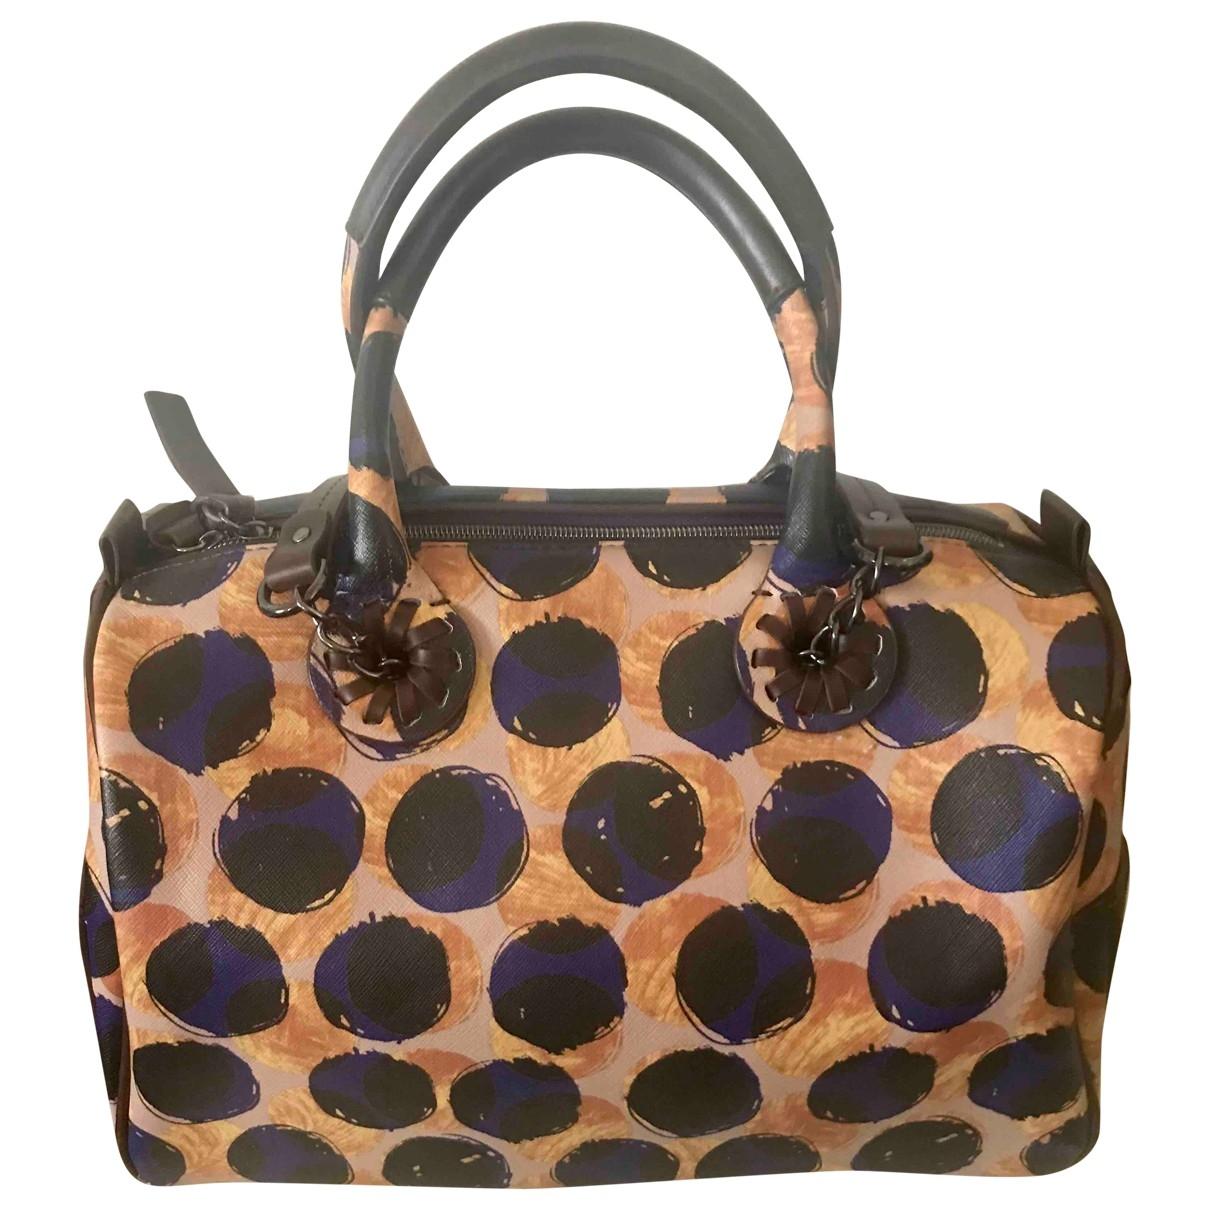 Maliparmi \N Handtasche in  Bunt Synthetik